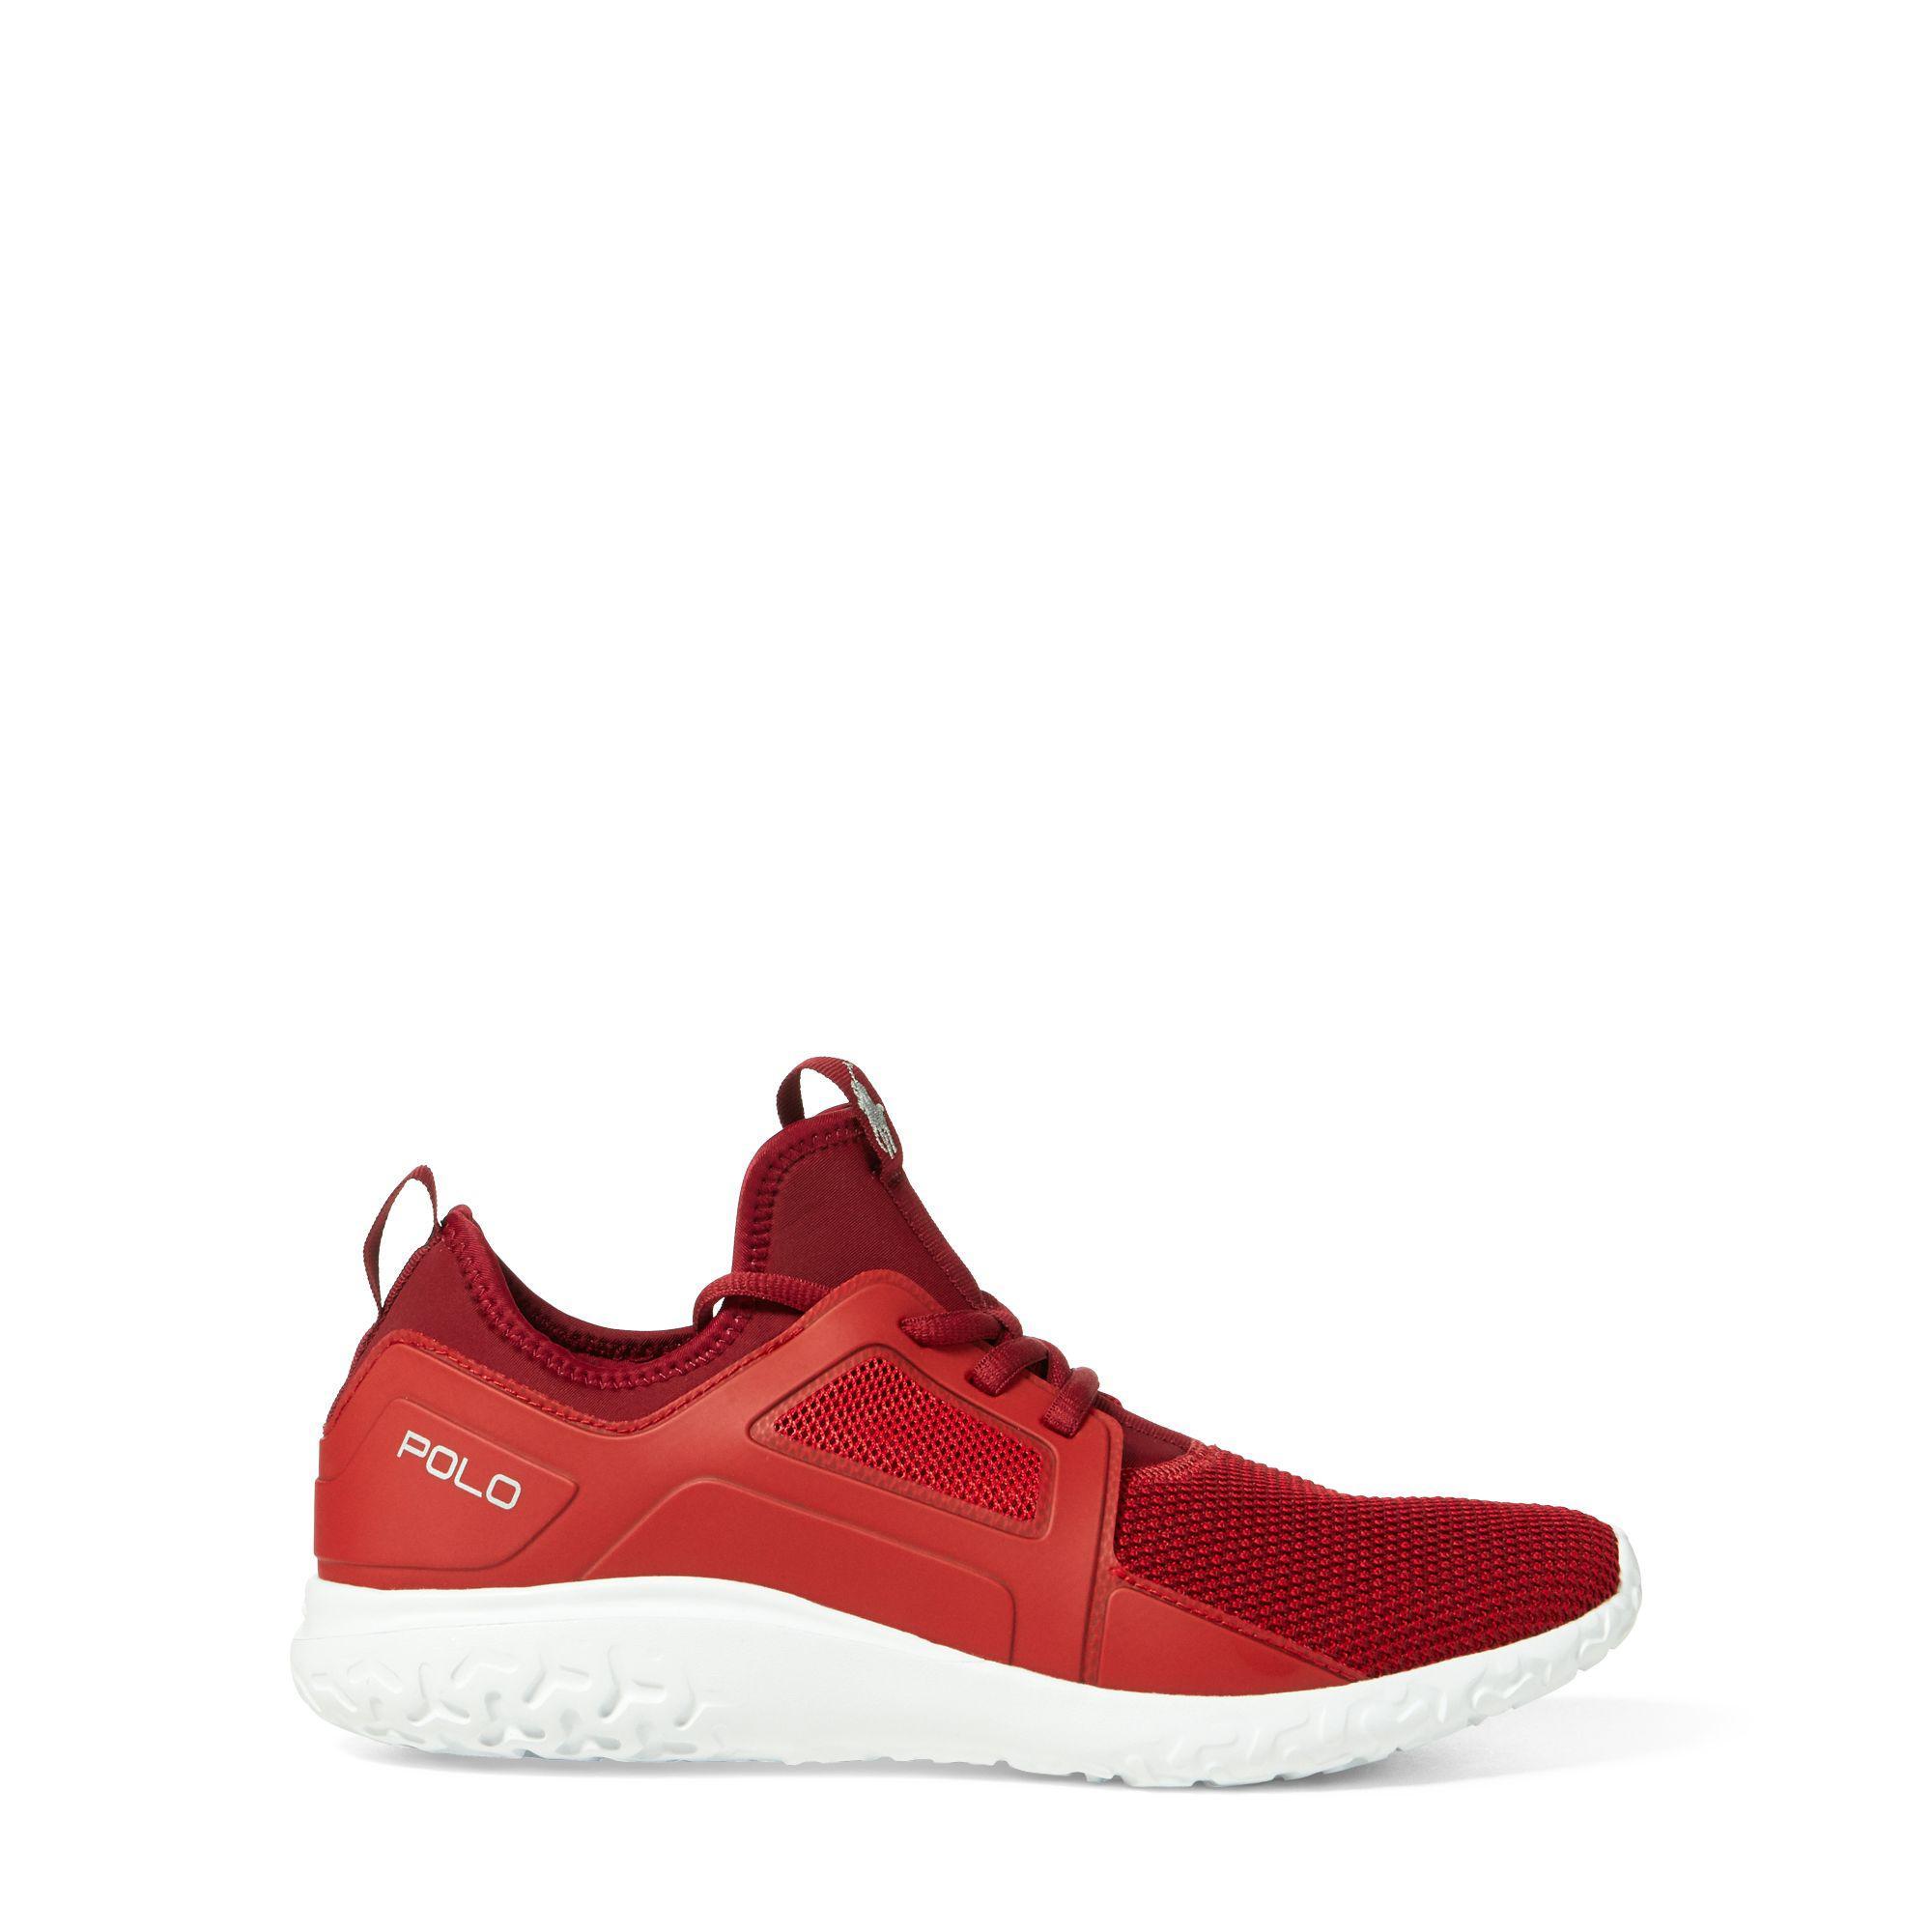 polo ralph lauren shoes faxon sneakersnstuff legitimacy